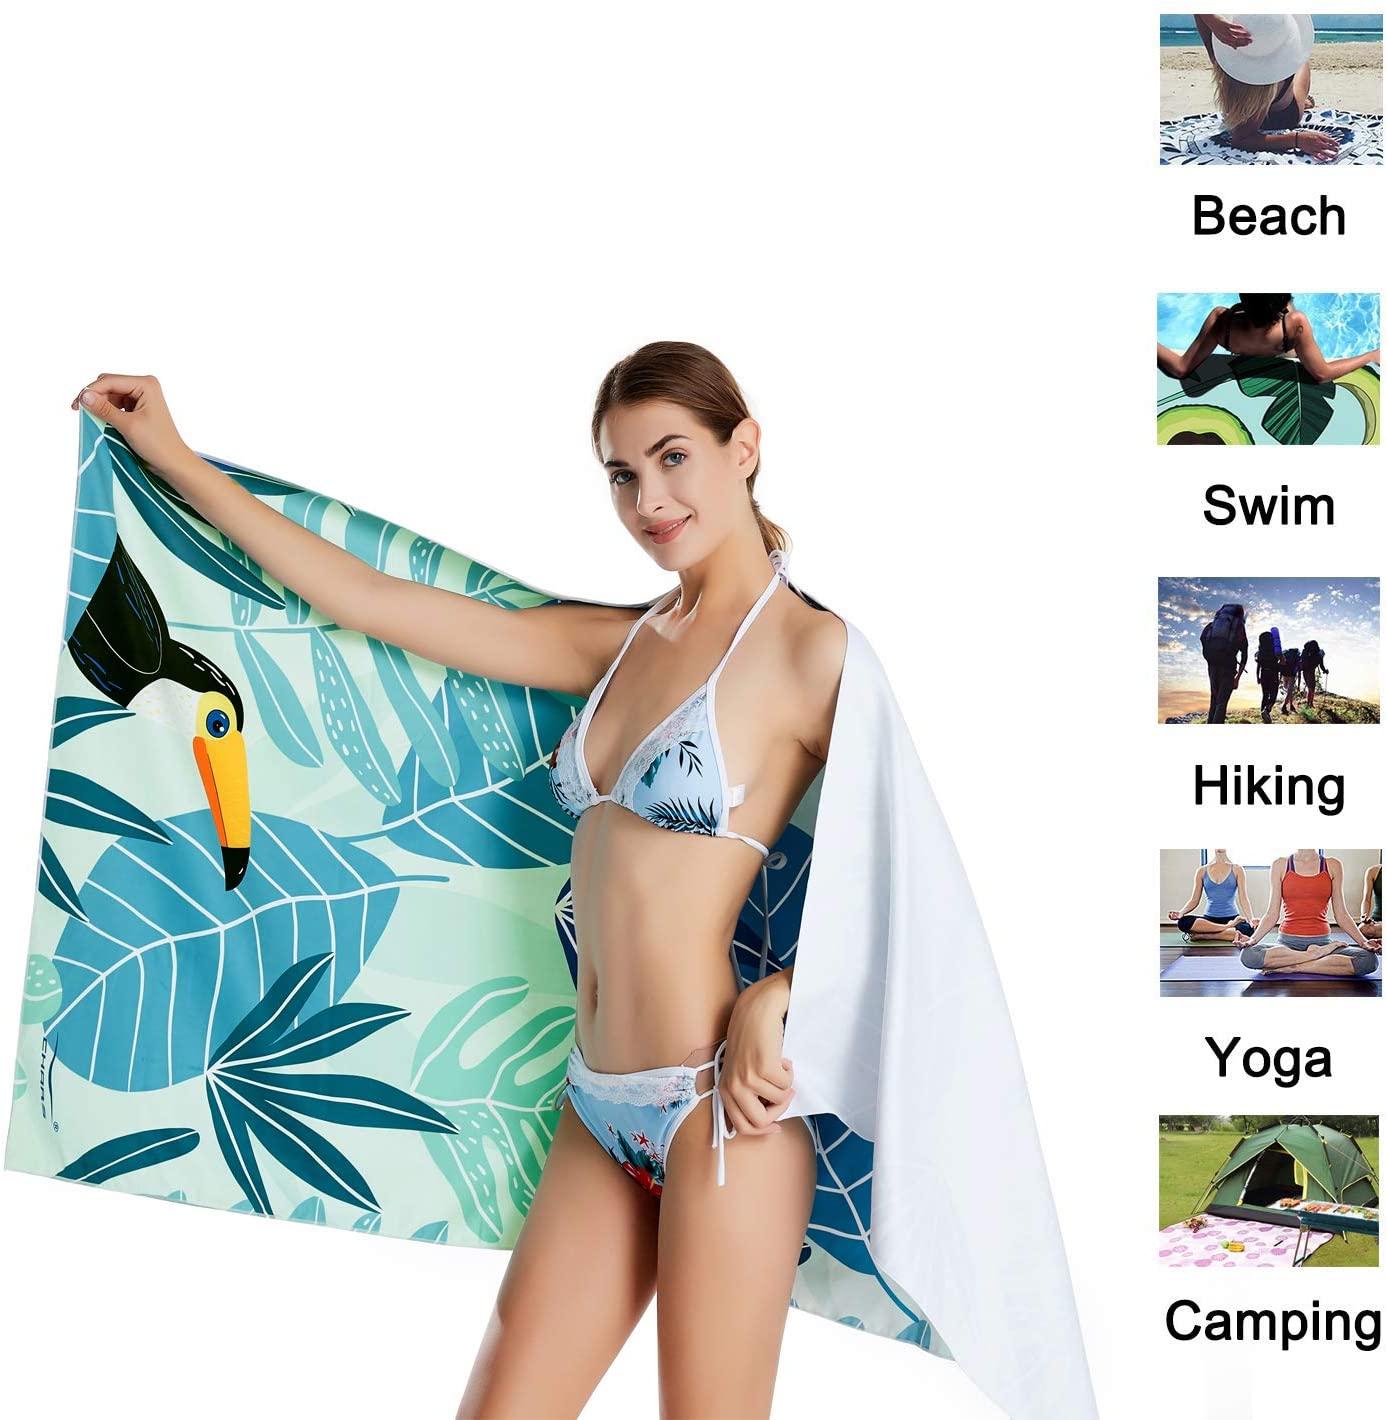 CHARS Microfiber Quick Drying Beach Towel